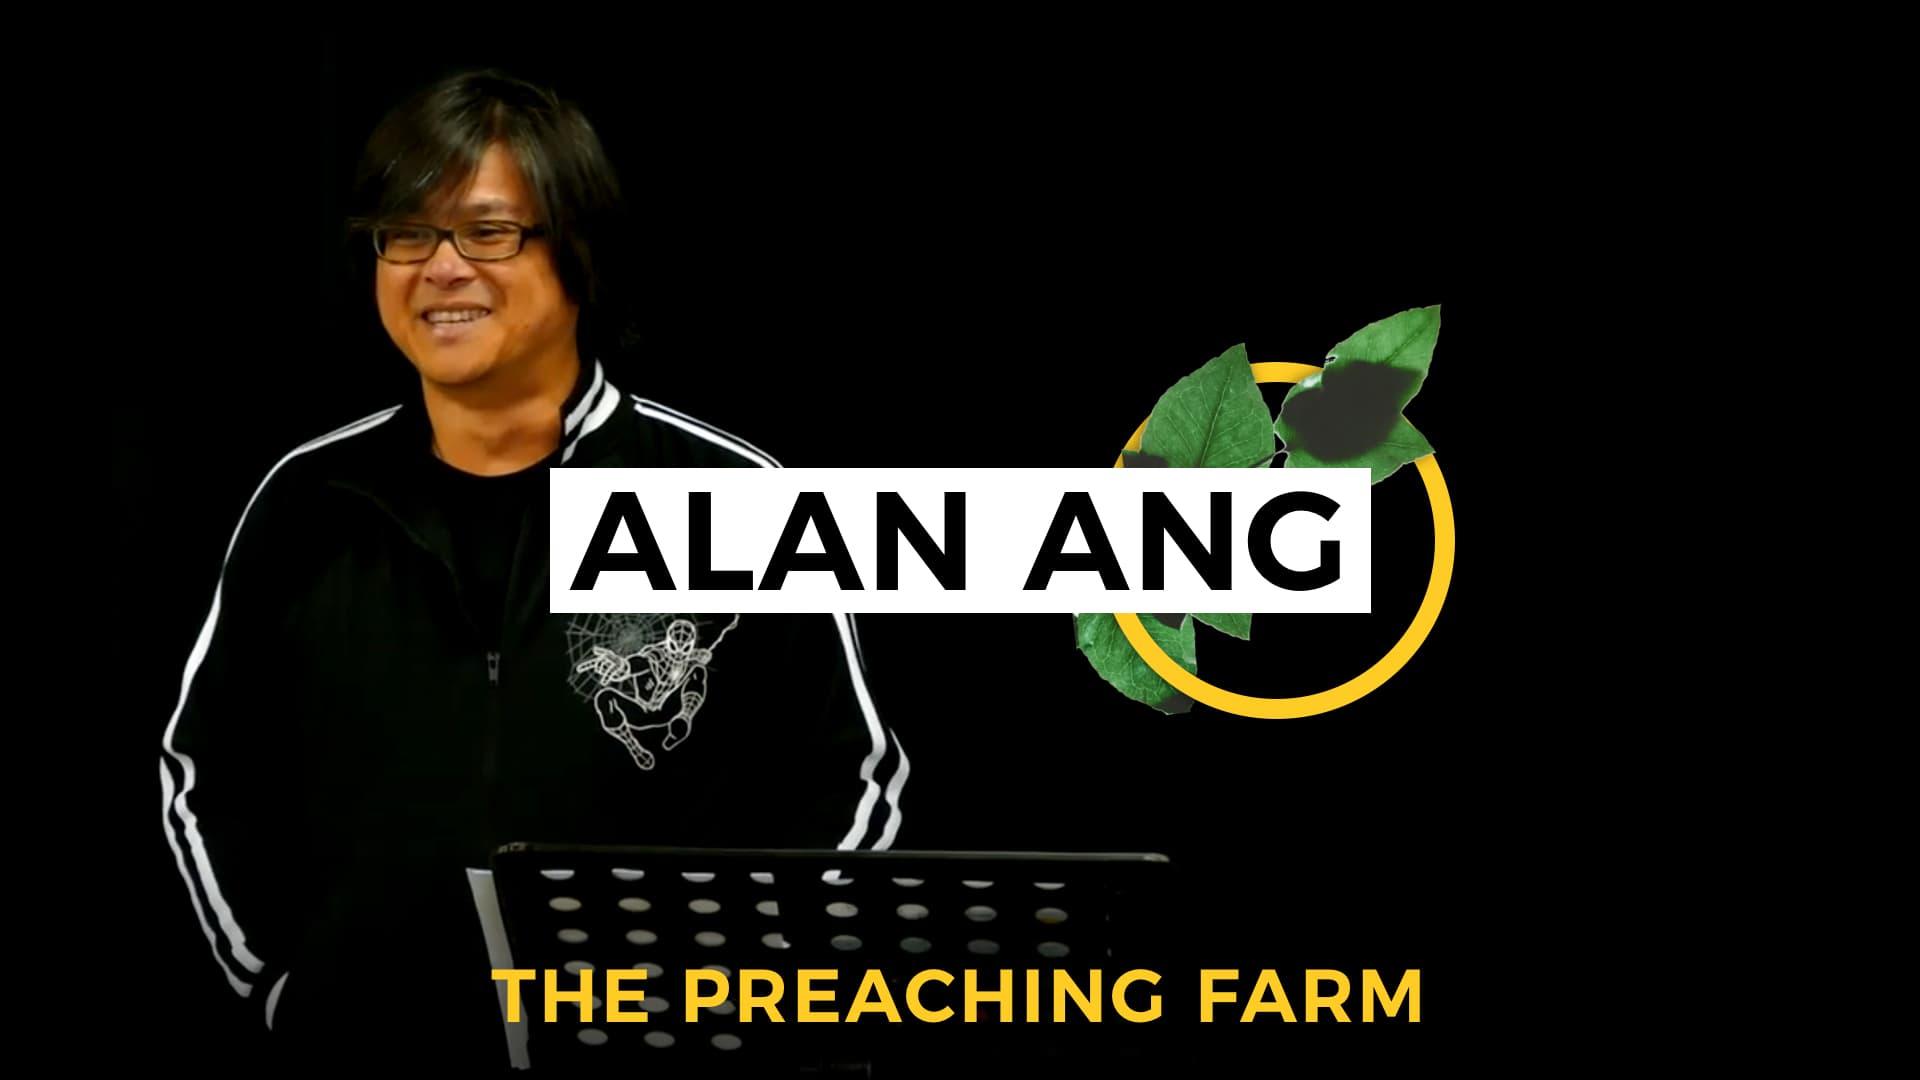 The Preaching Farm 1: Alan Ang